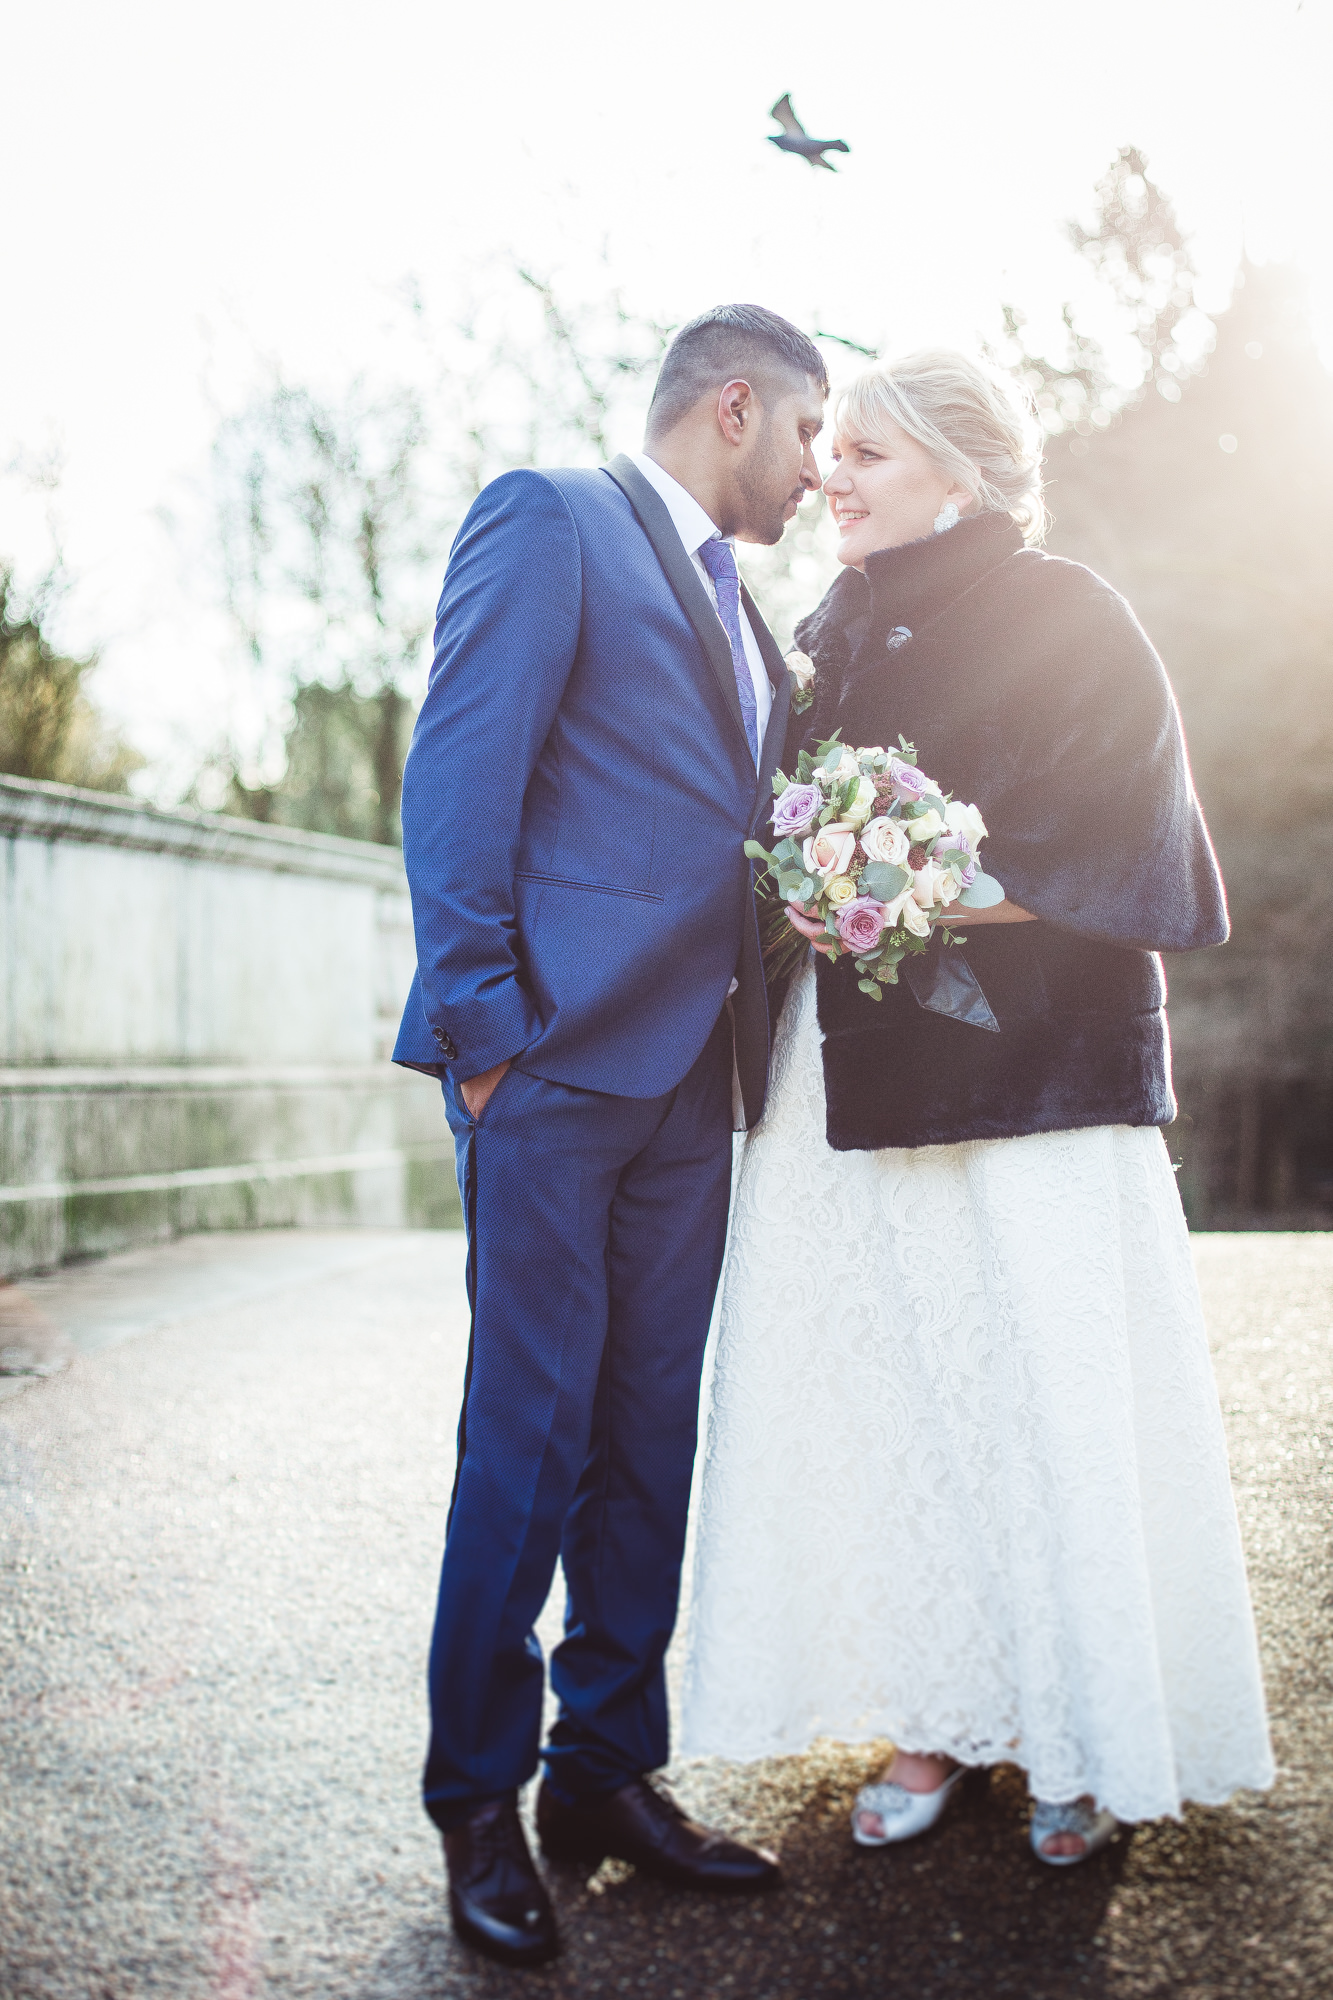 London Wedding Vilcinskaite Photo 35.jpg